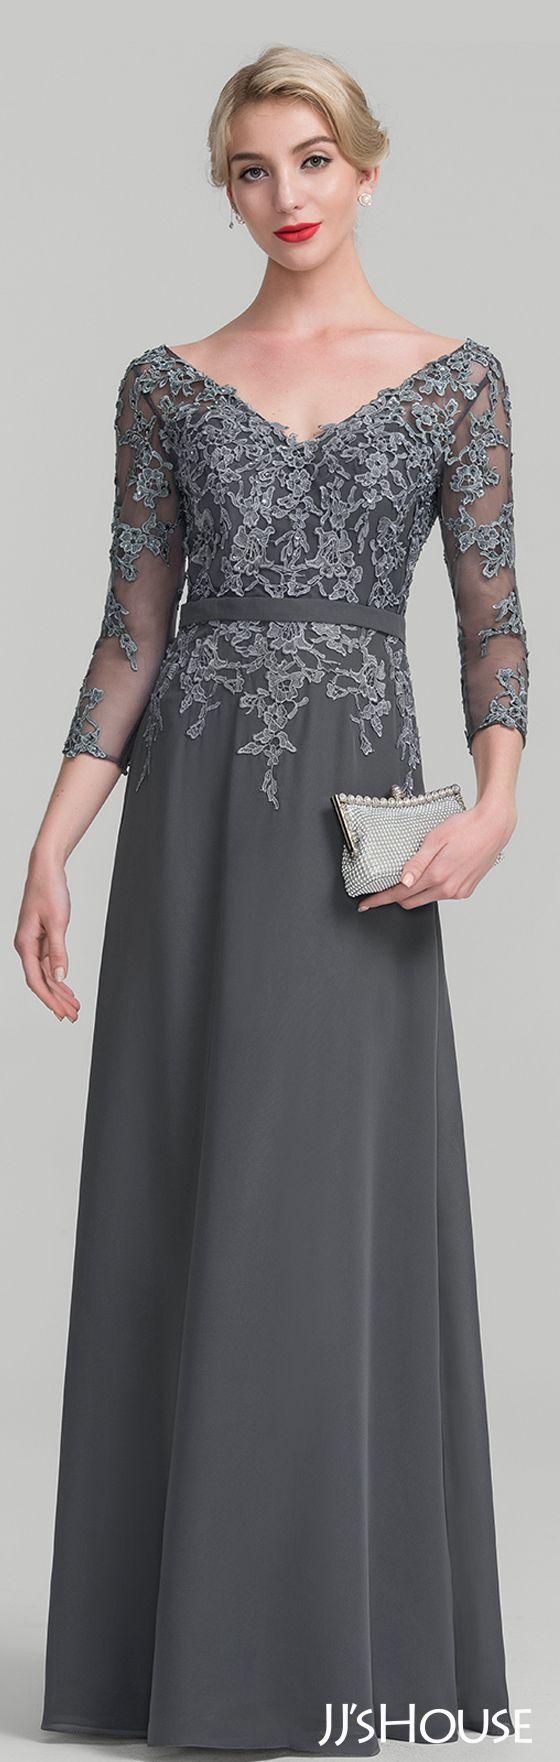 600+ best JJ\'s House Mother Dresses images by JJ\'s House® on Pinterest